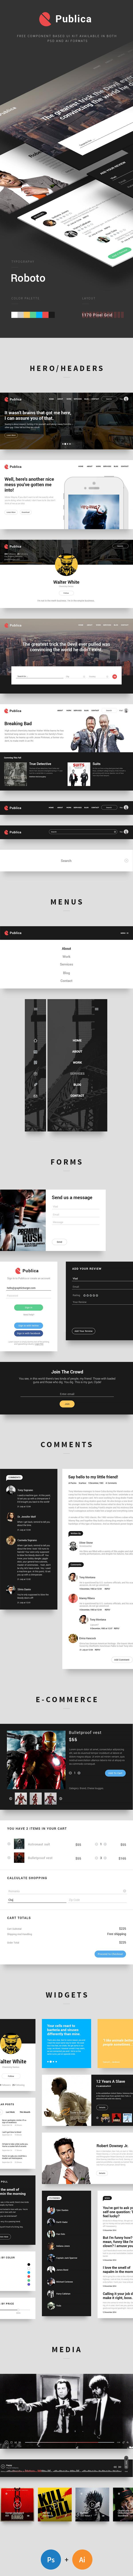 Publica UI Kit (Free PSD + AI) on Behance